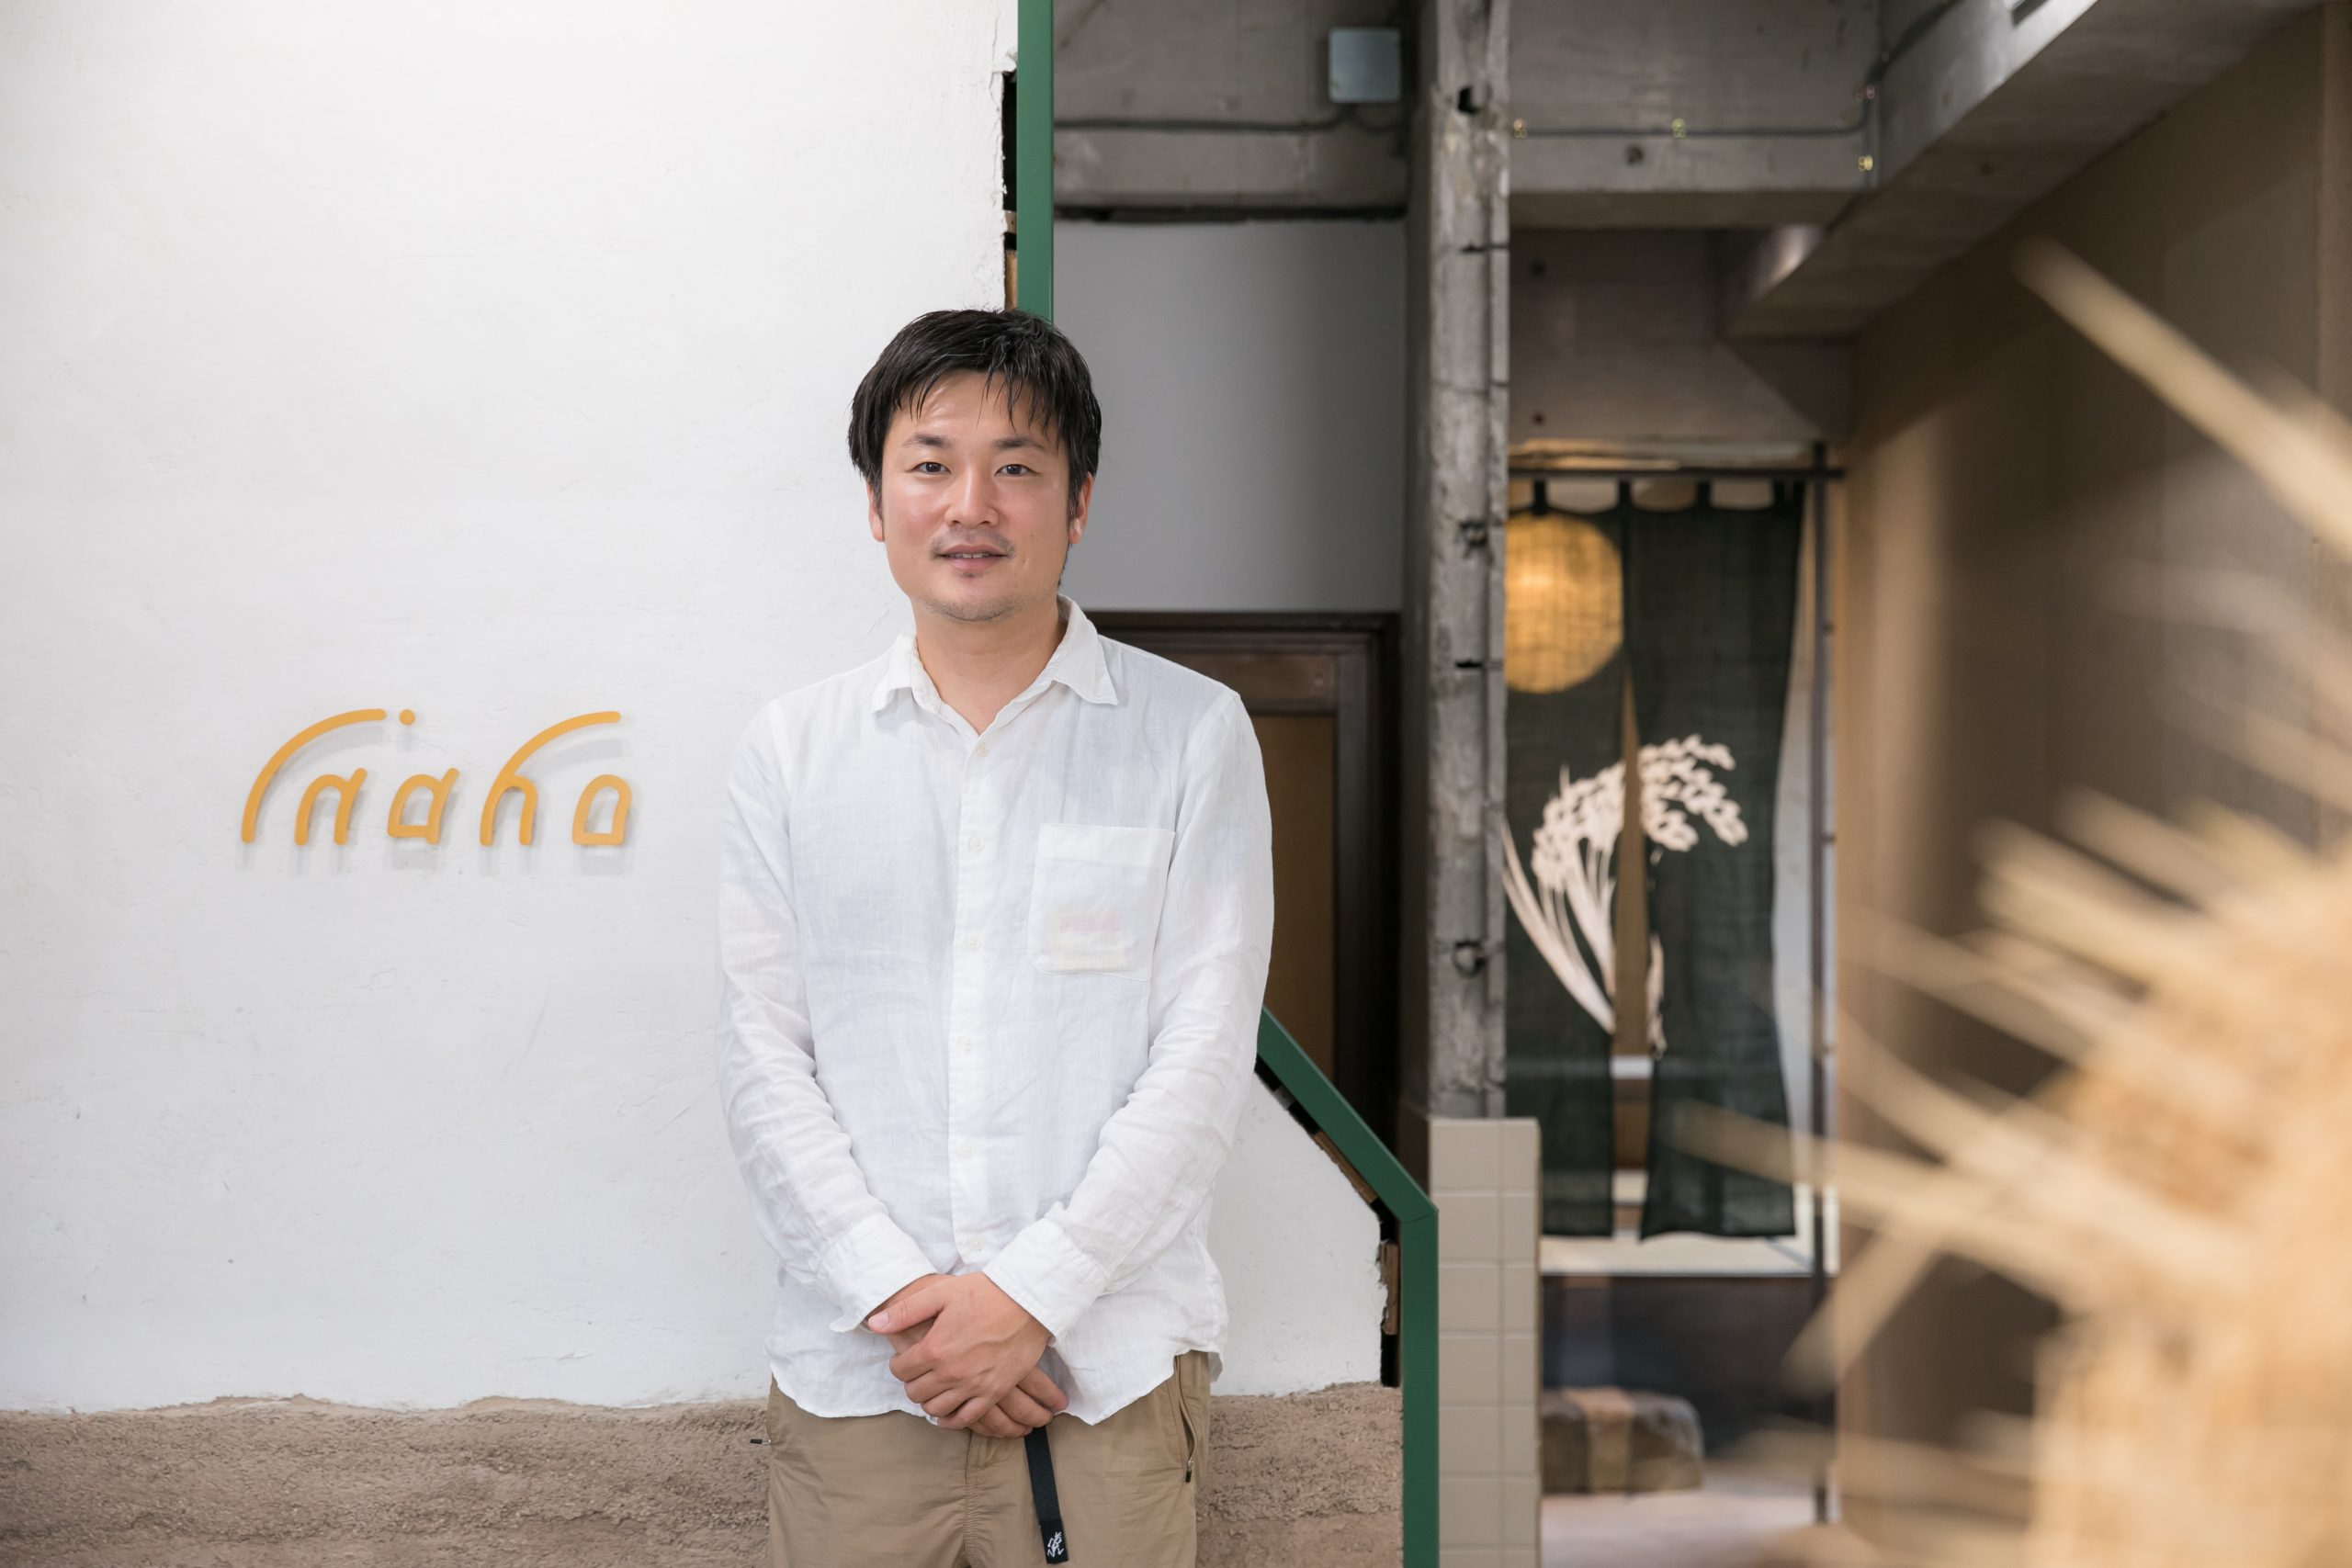 inaho株式会社CEO菱木